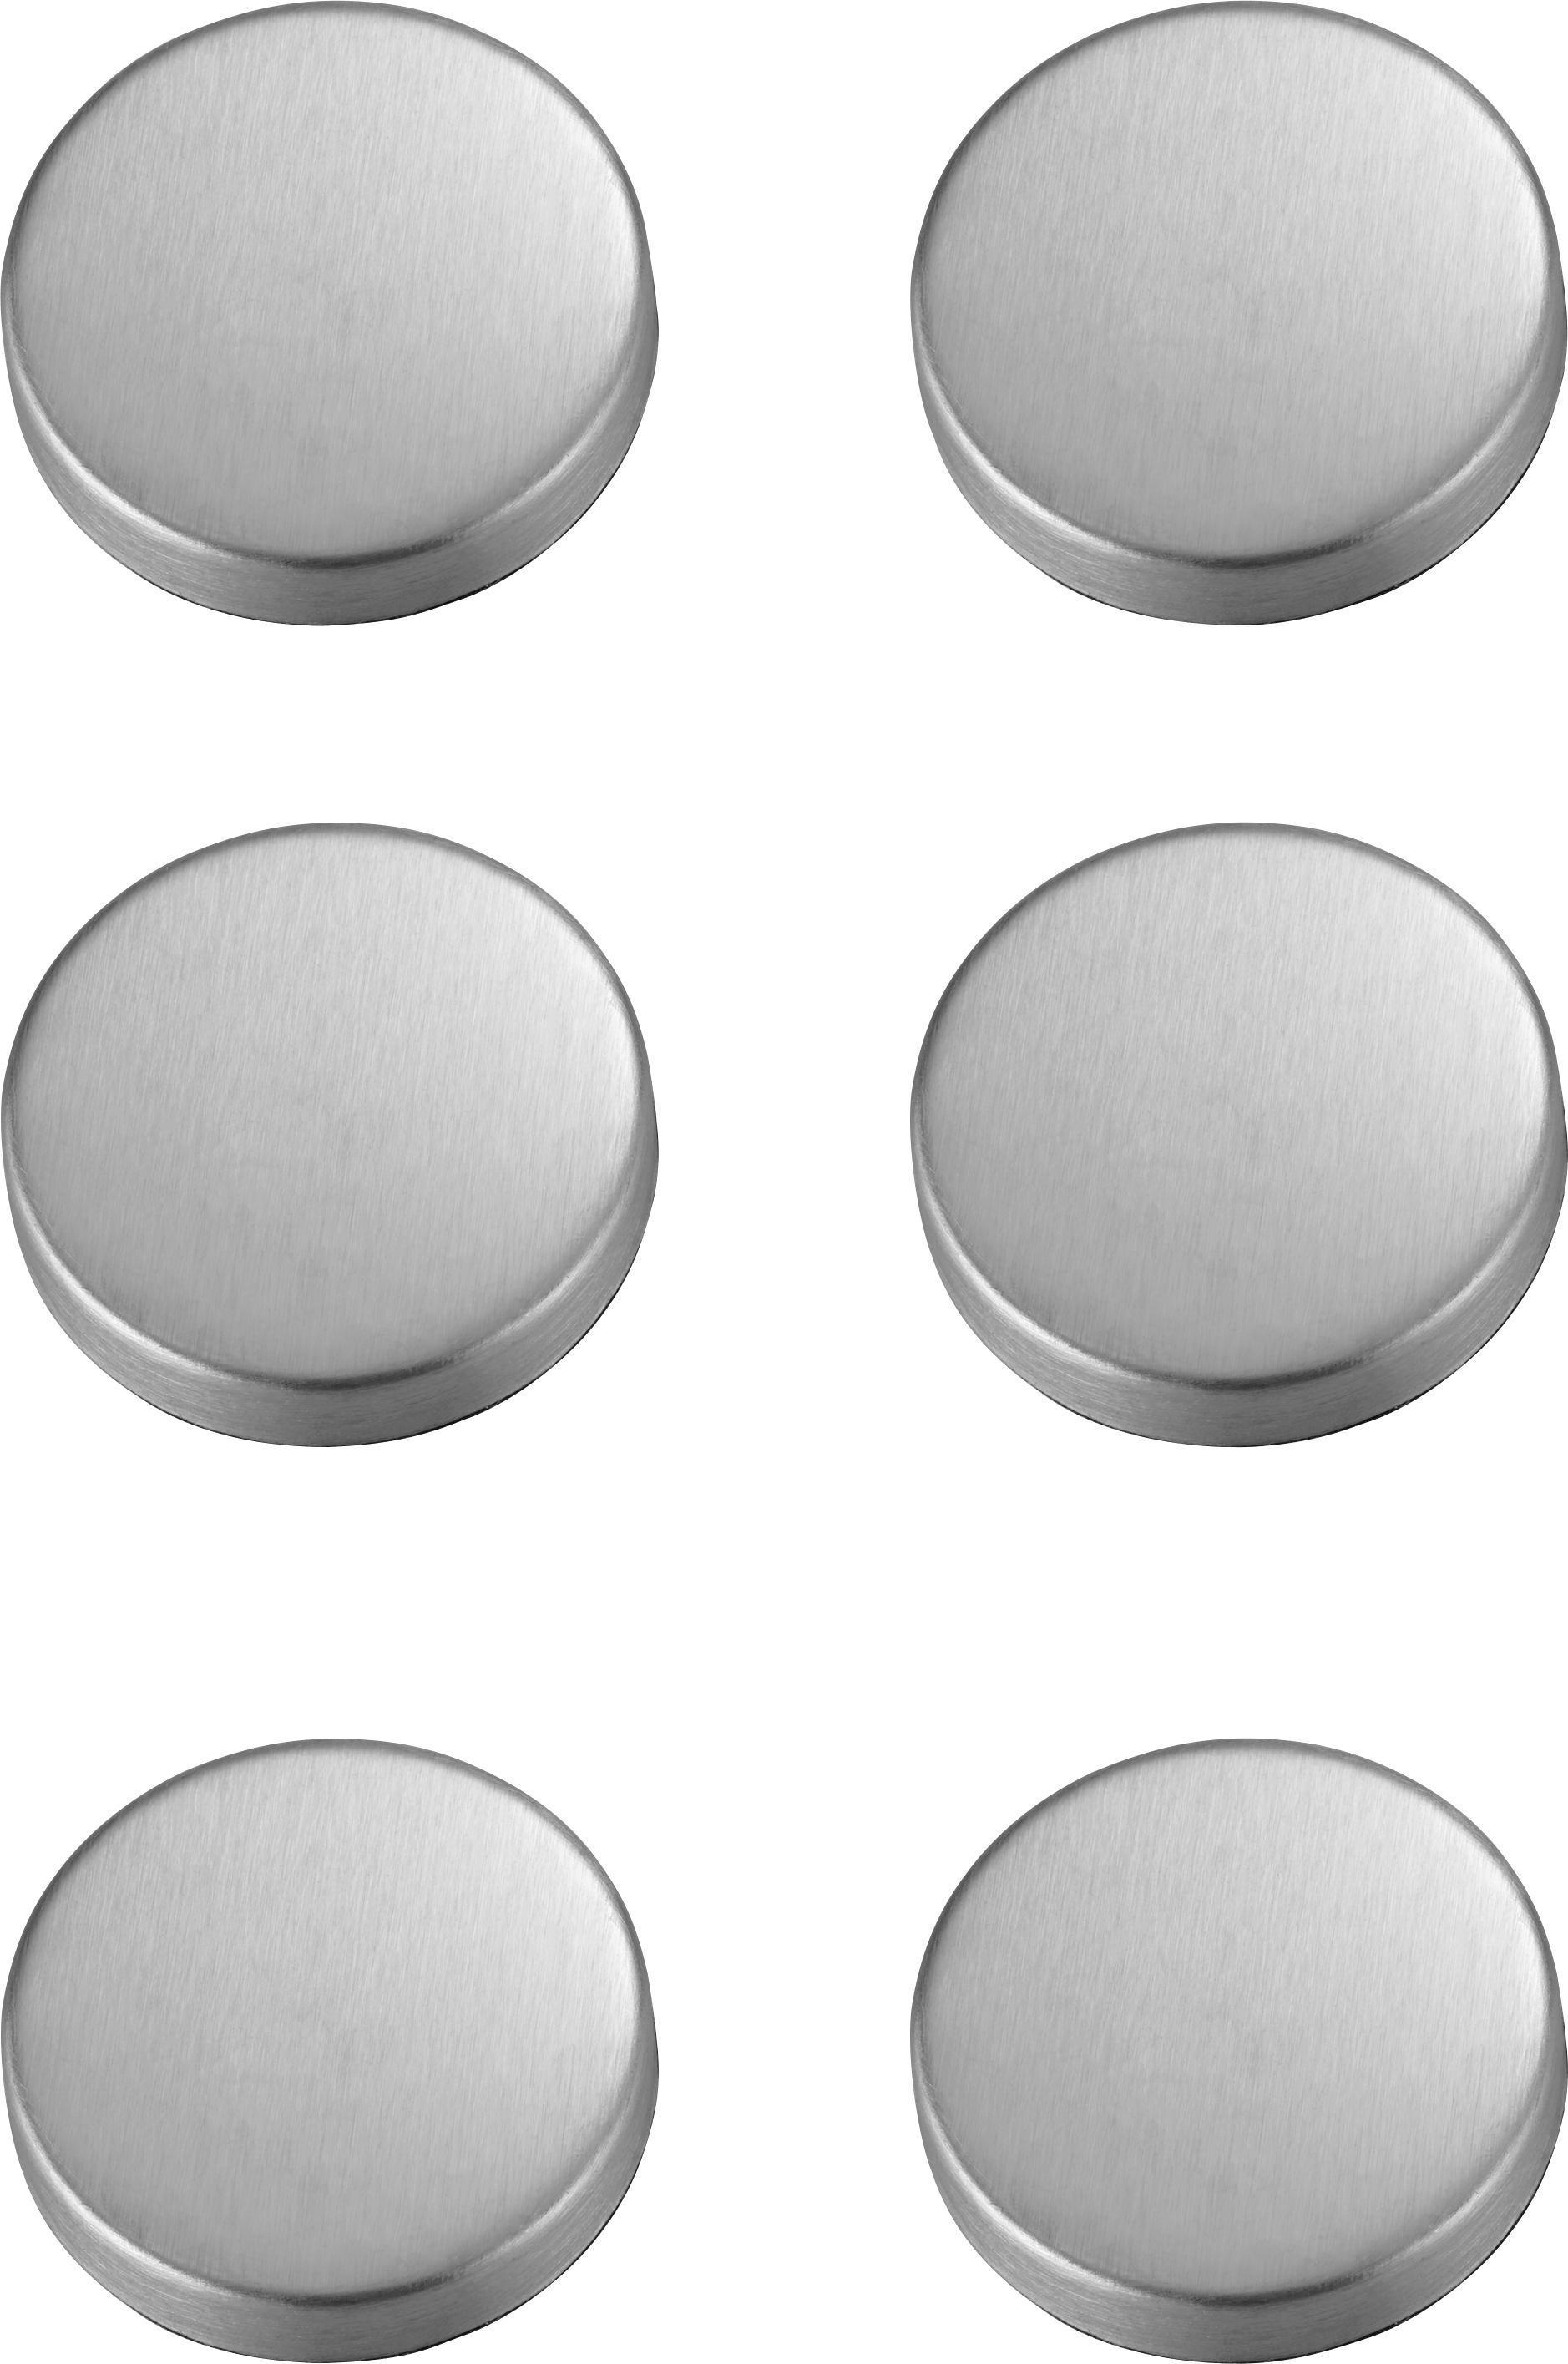 Magnet Maggie - Edelstahlfarben, Metall (3,2cm) - MÖMAX modern living